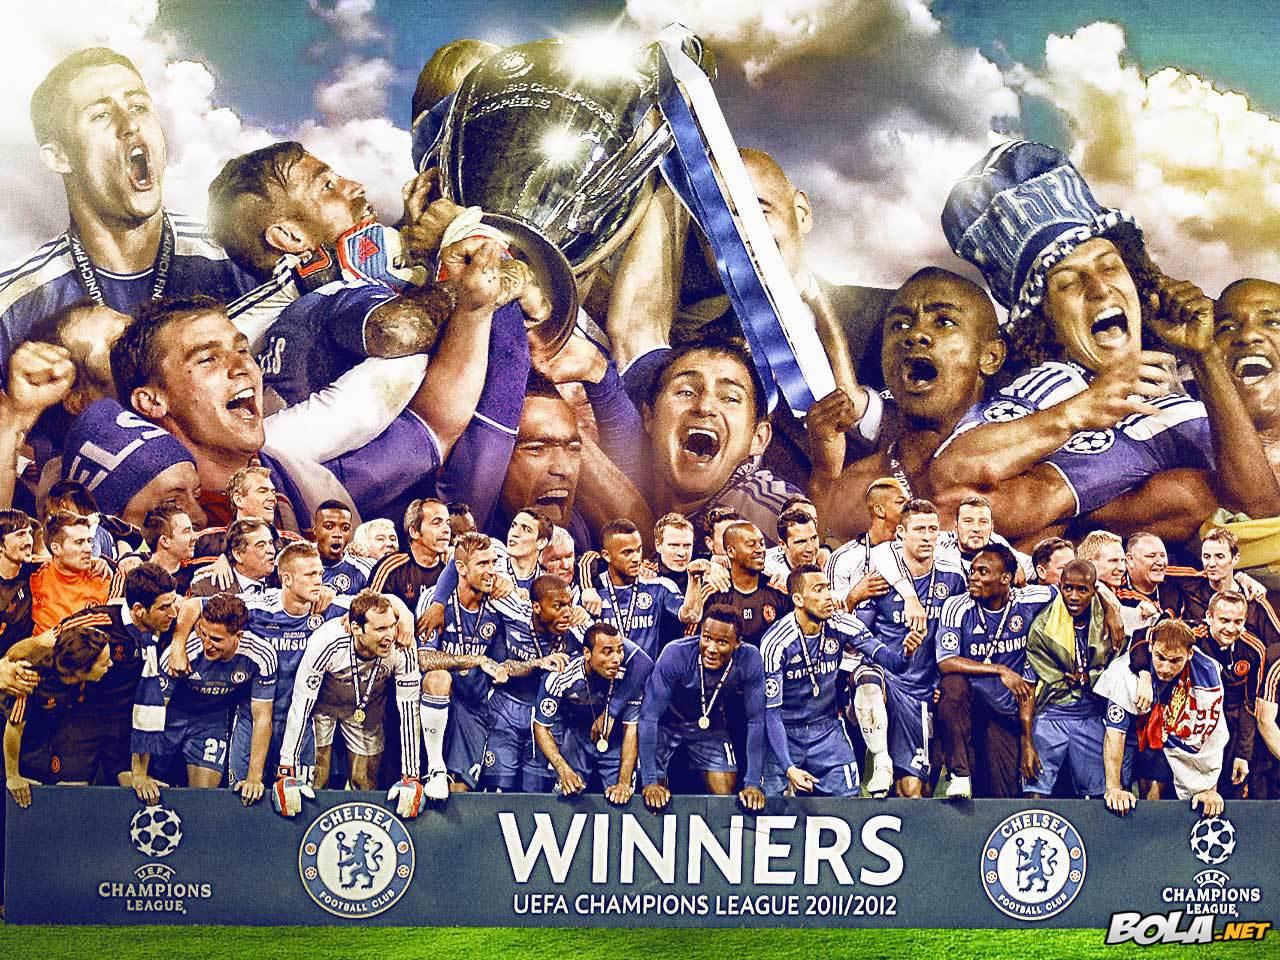 Premiership Wallpaper Chelsea Champions League 2012 HD Wallpaper 1280x960